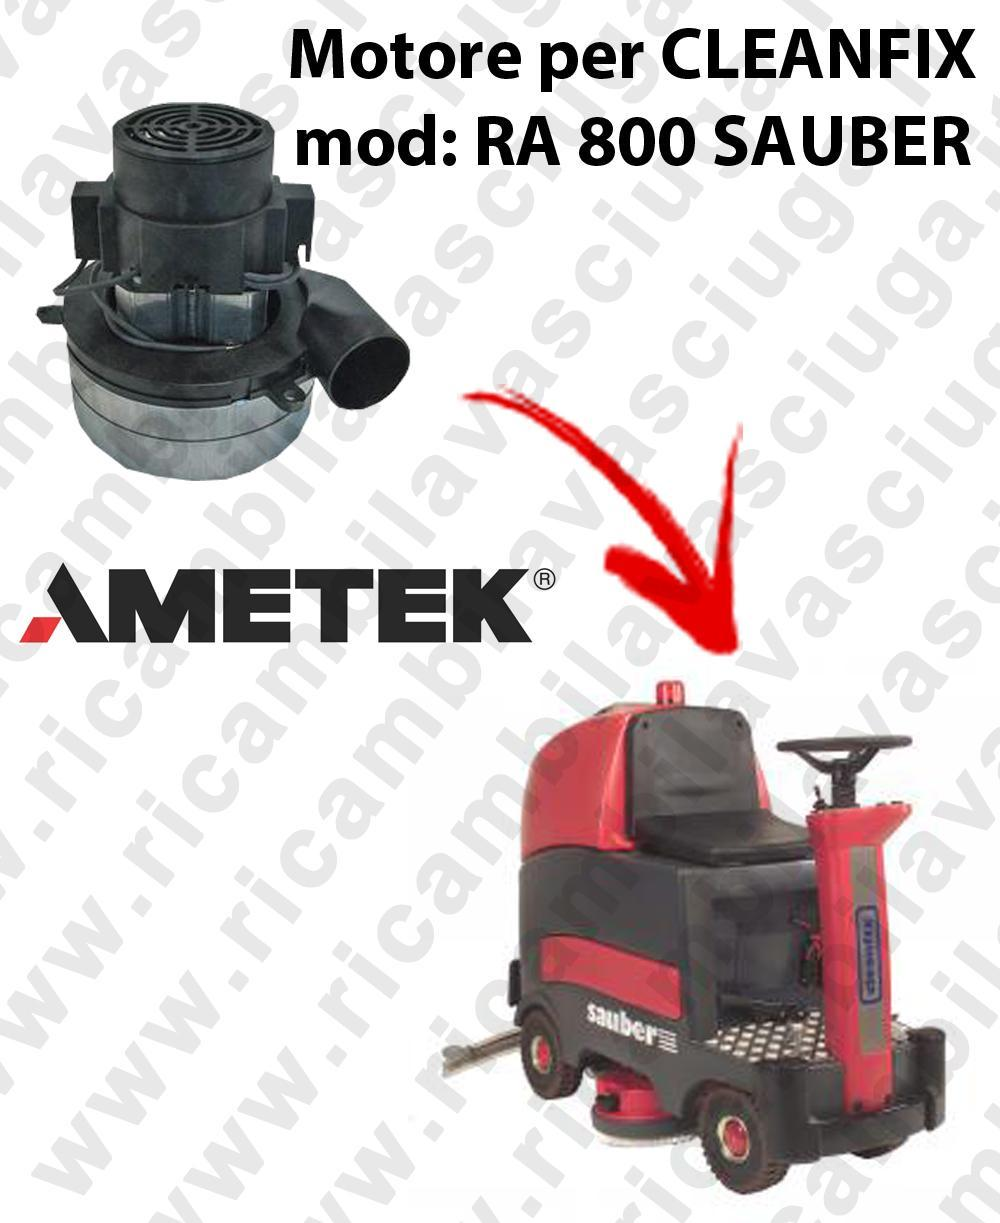 RA 800 SAUBER Motore de aspiración Ametek Italia  para fregadora CLEANFIX